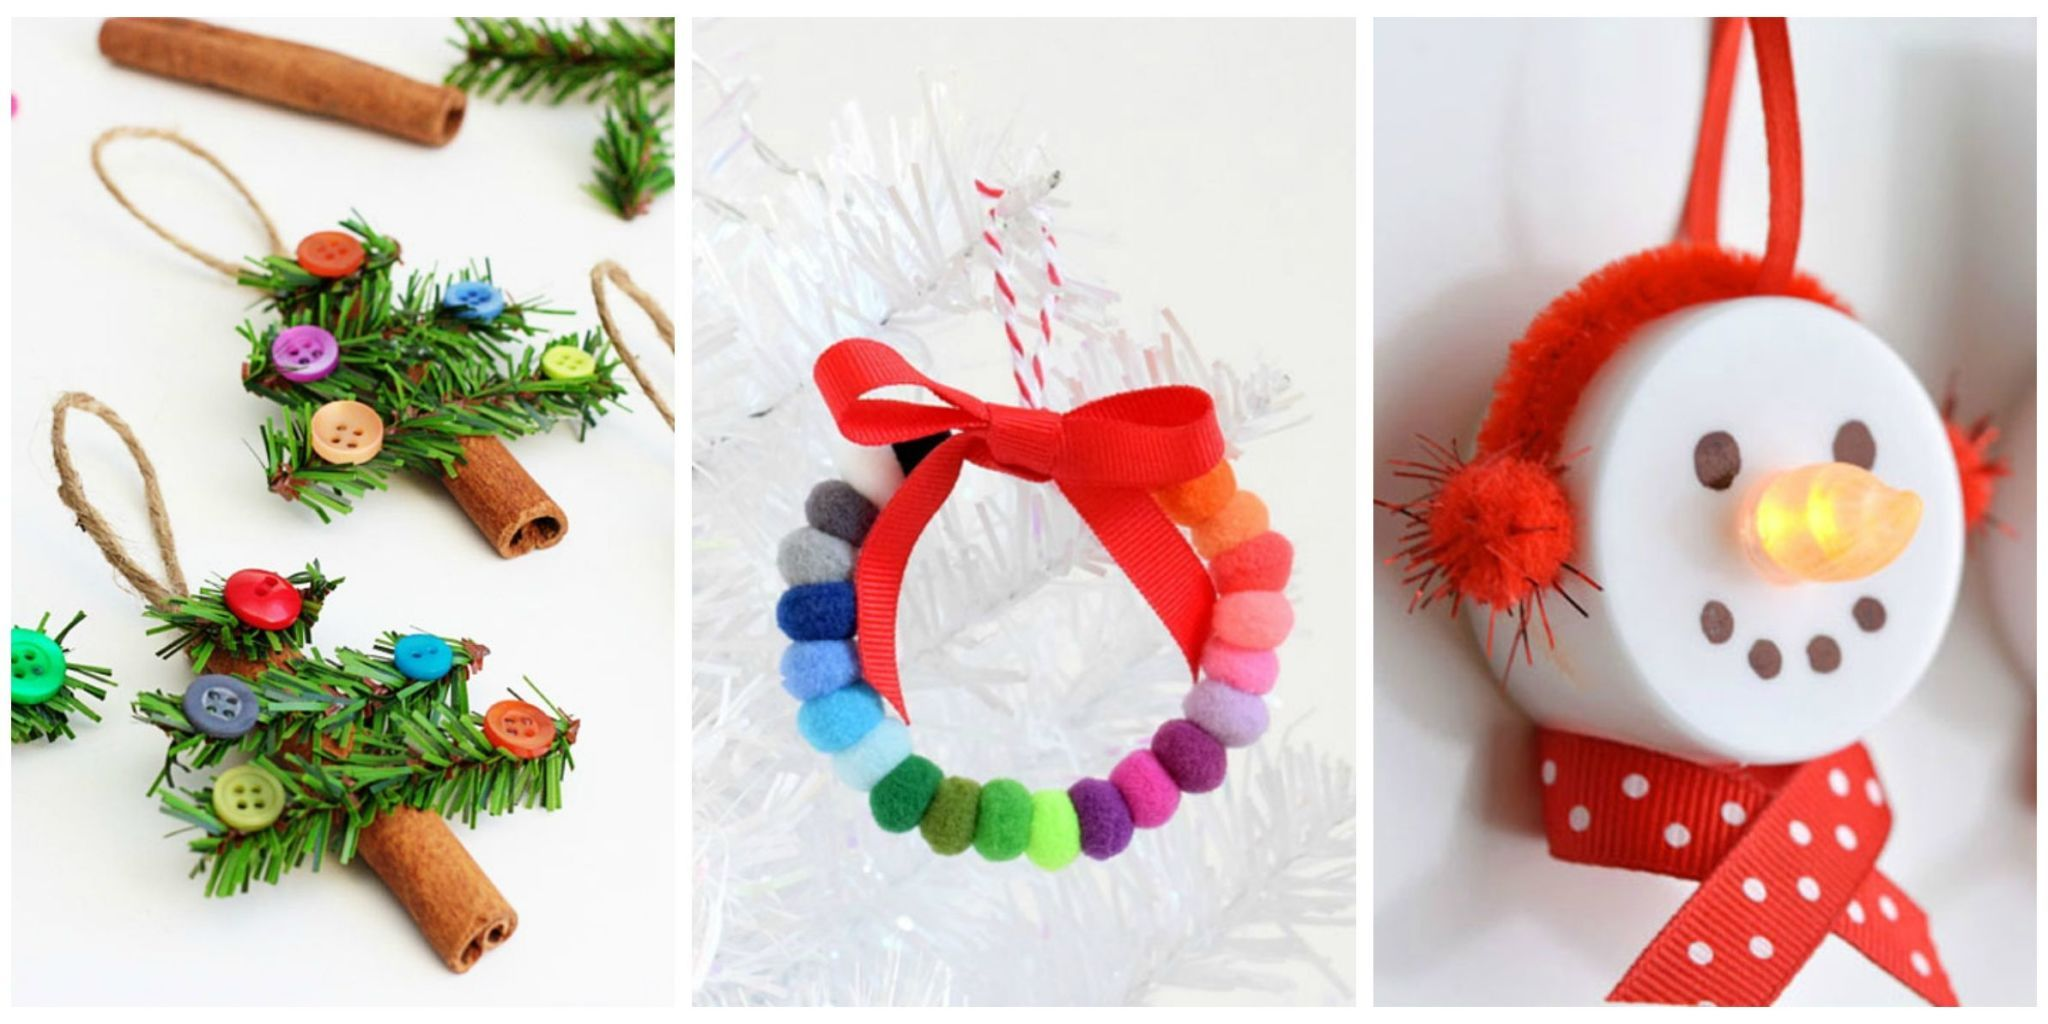 59 Unique DIY Christmas Ornaments , Easy Homemade Ornament Ideas